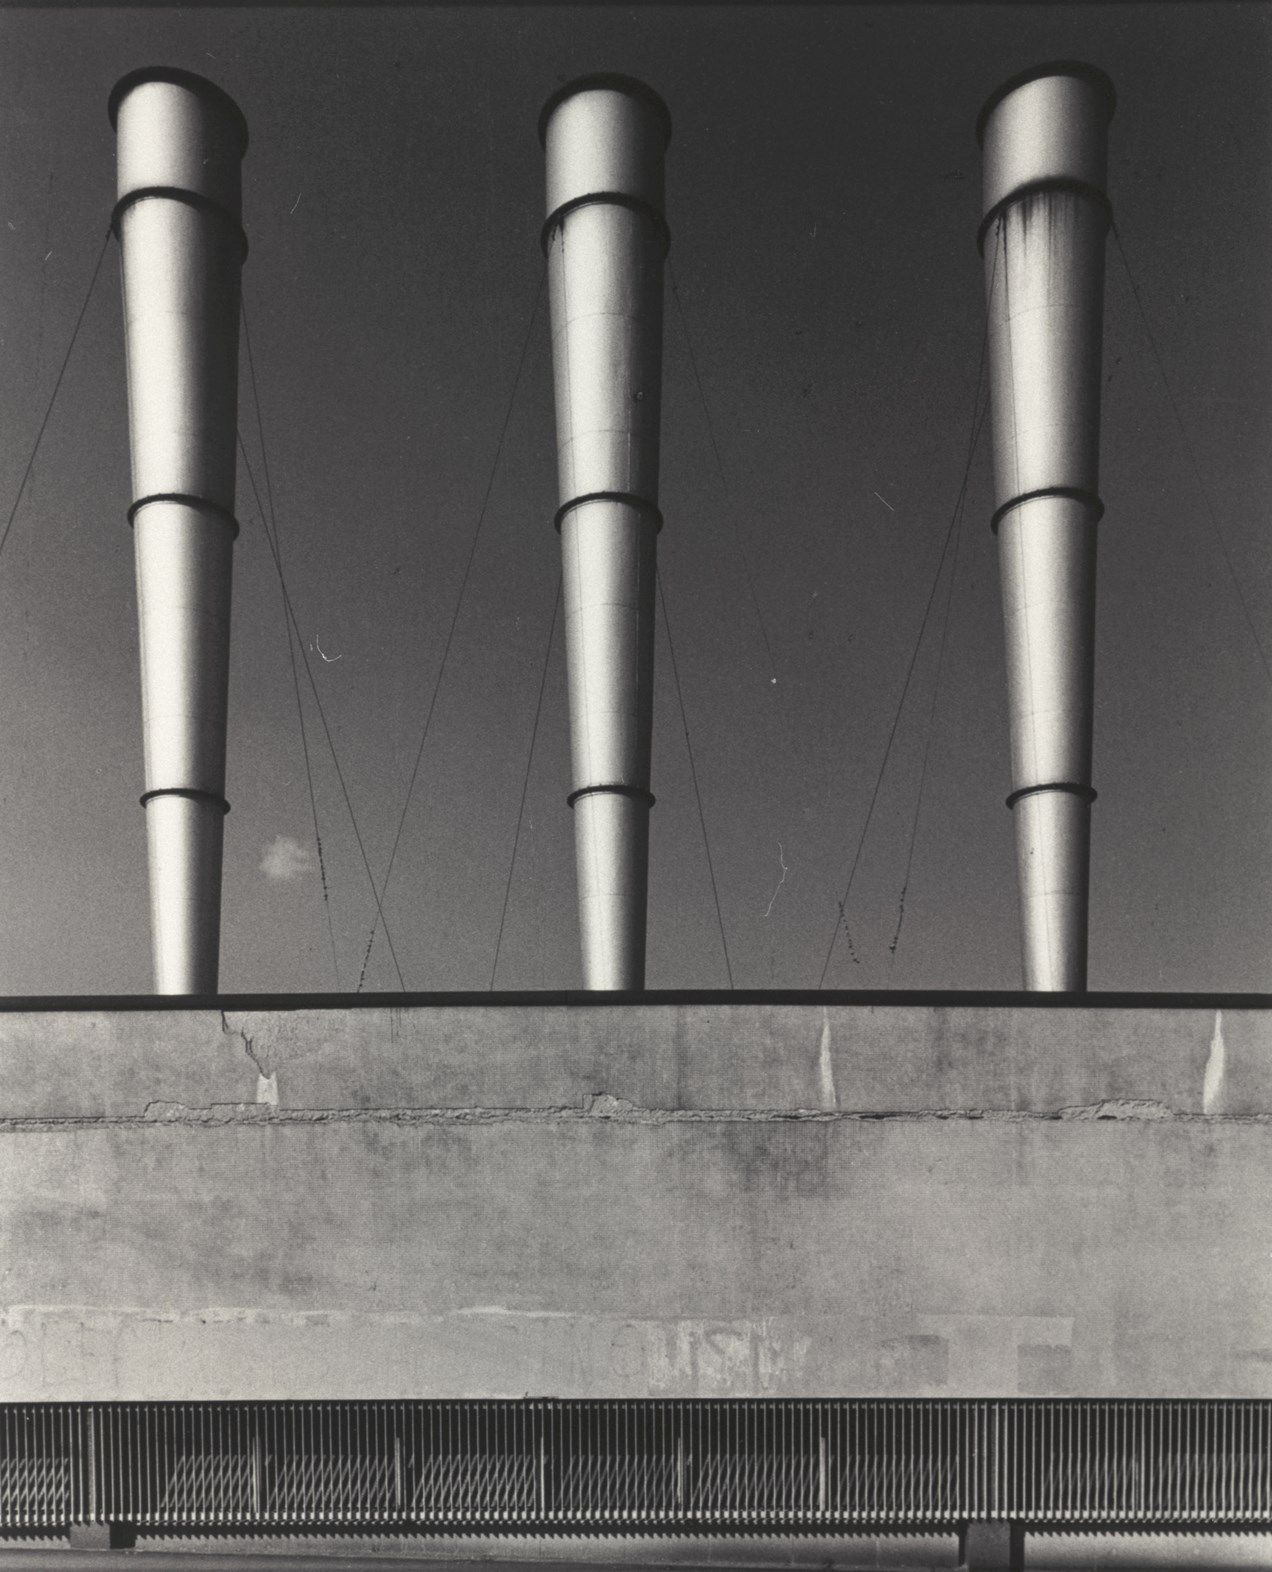 Gabriele Basilico, Milano 1978-80 (3069 fot.13), 1980 © Gabriele Basilico / Studio Basilico, Milano